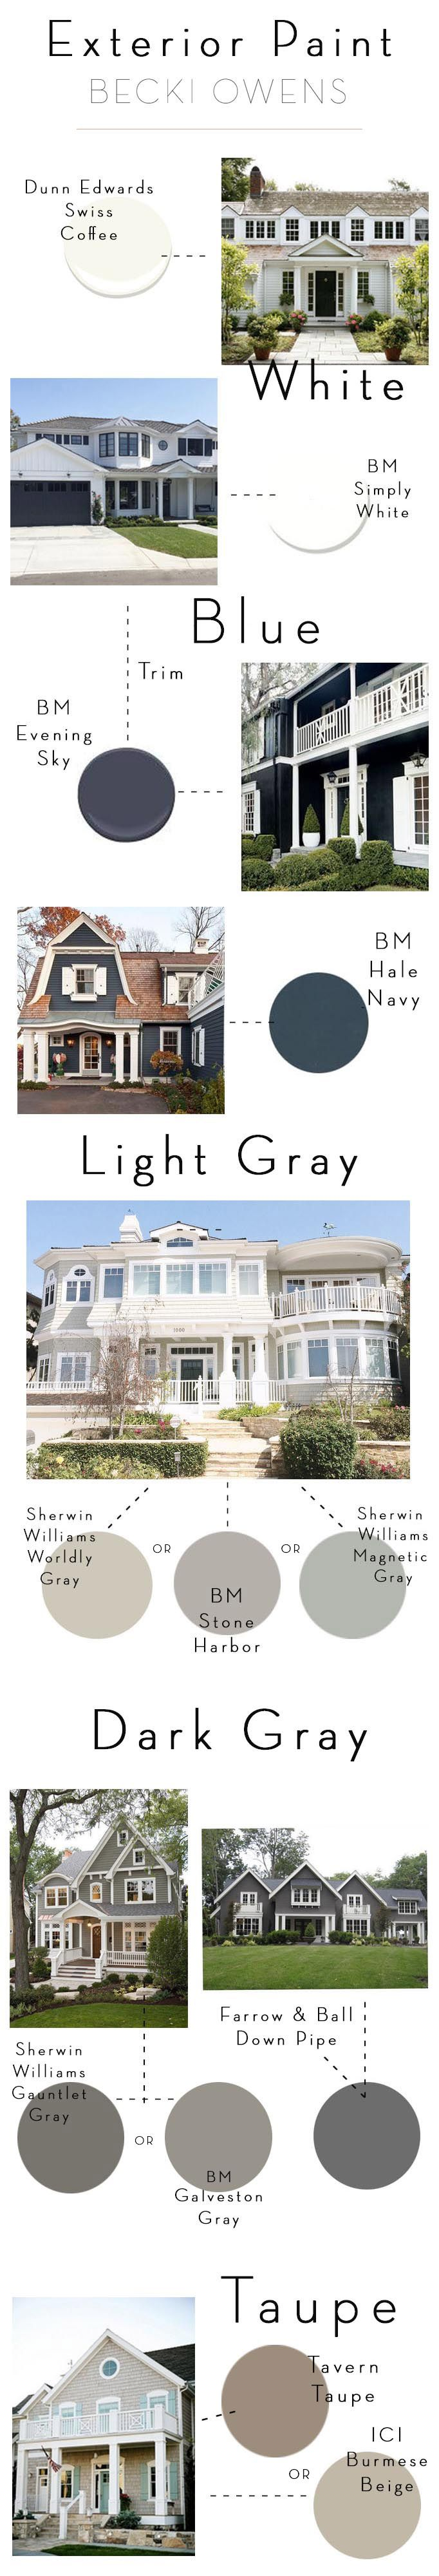 165 best Home - House Exteriors images on Pinterest | Arquitetura ...